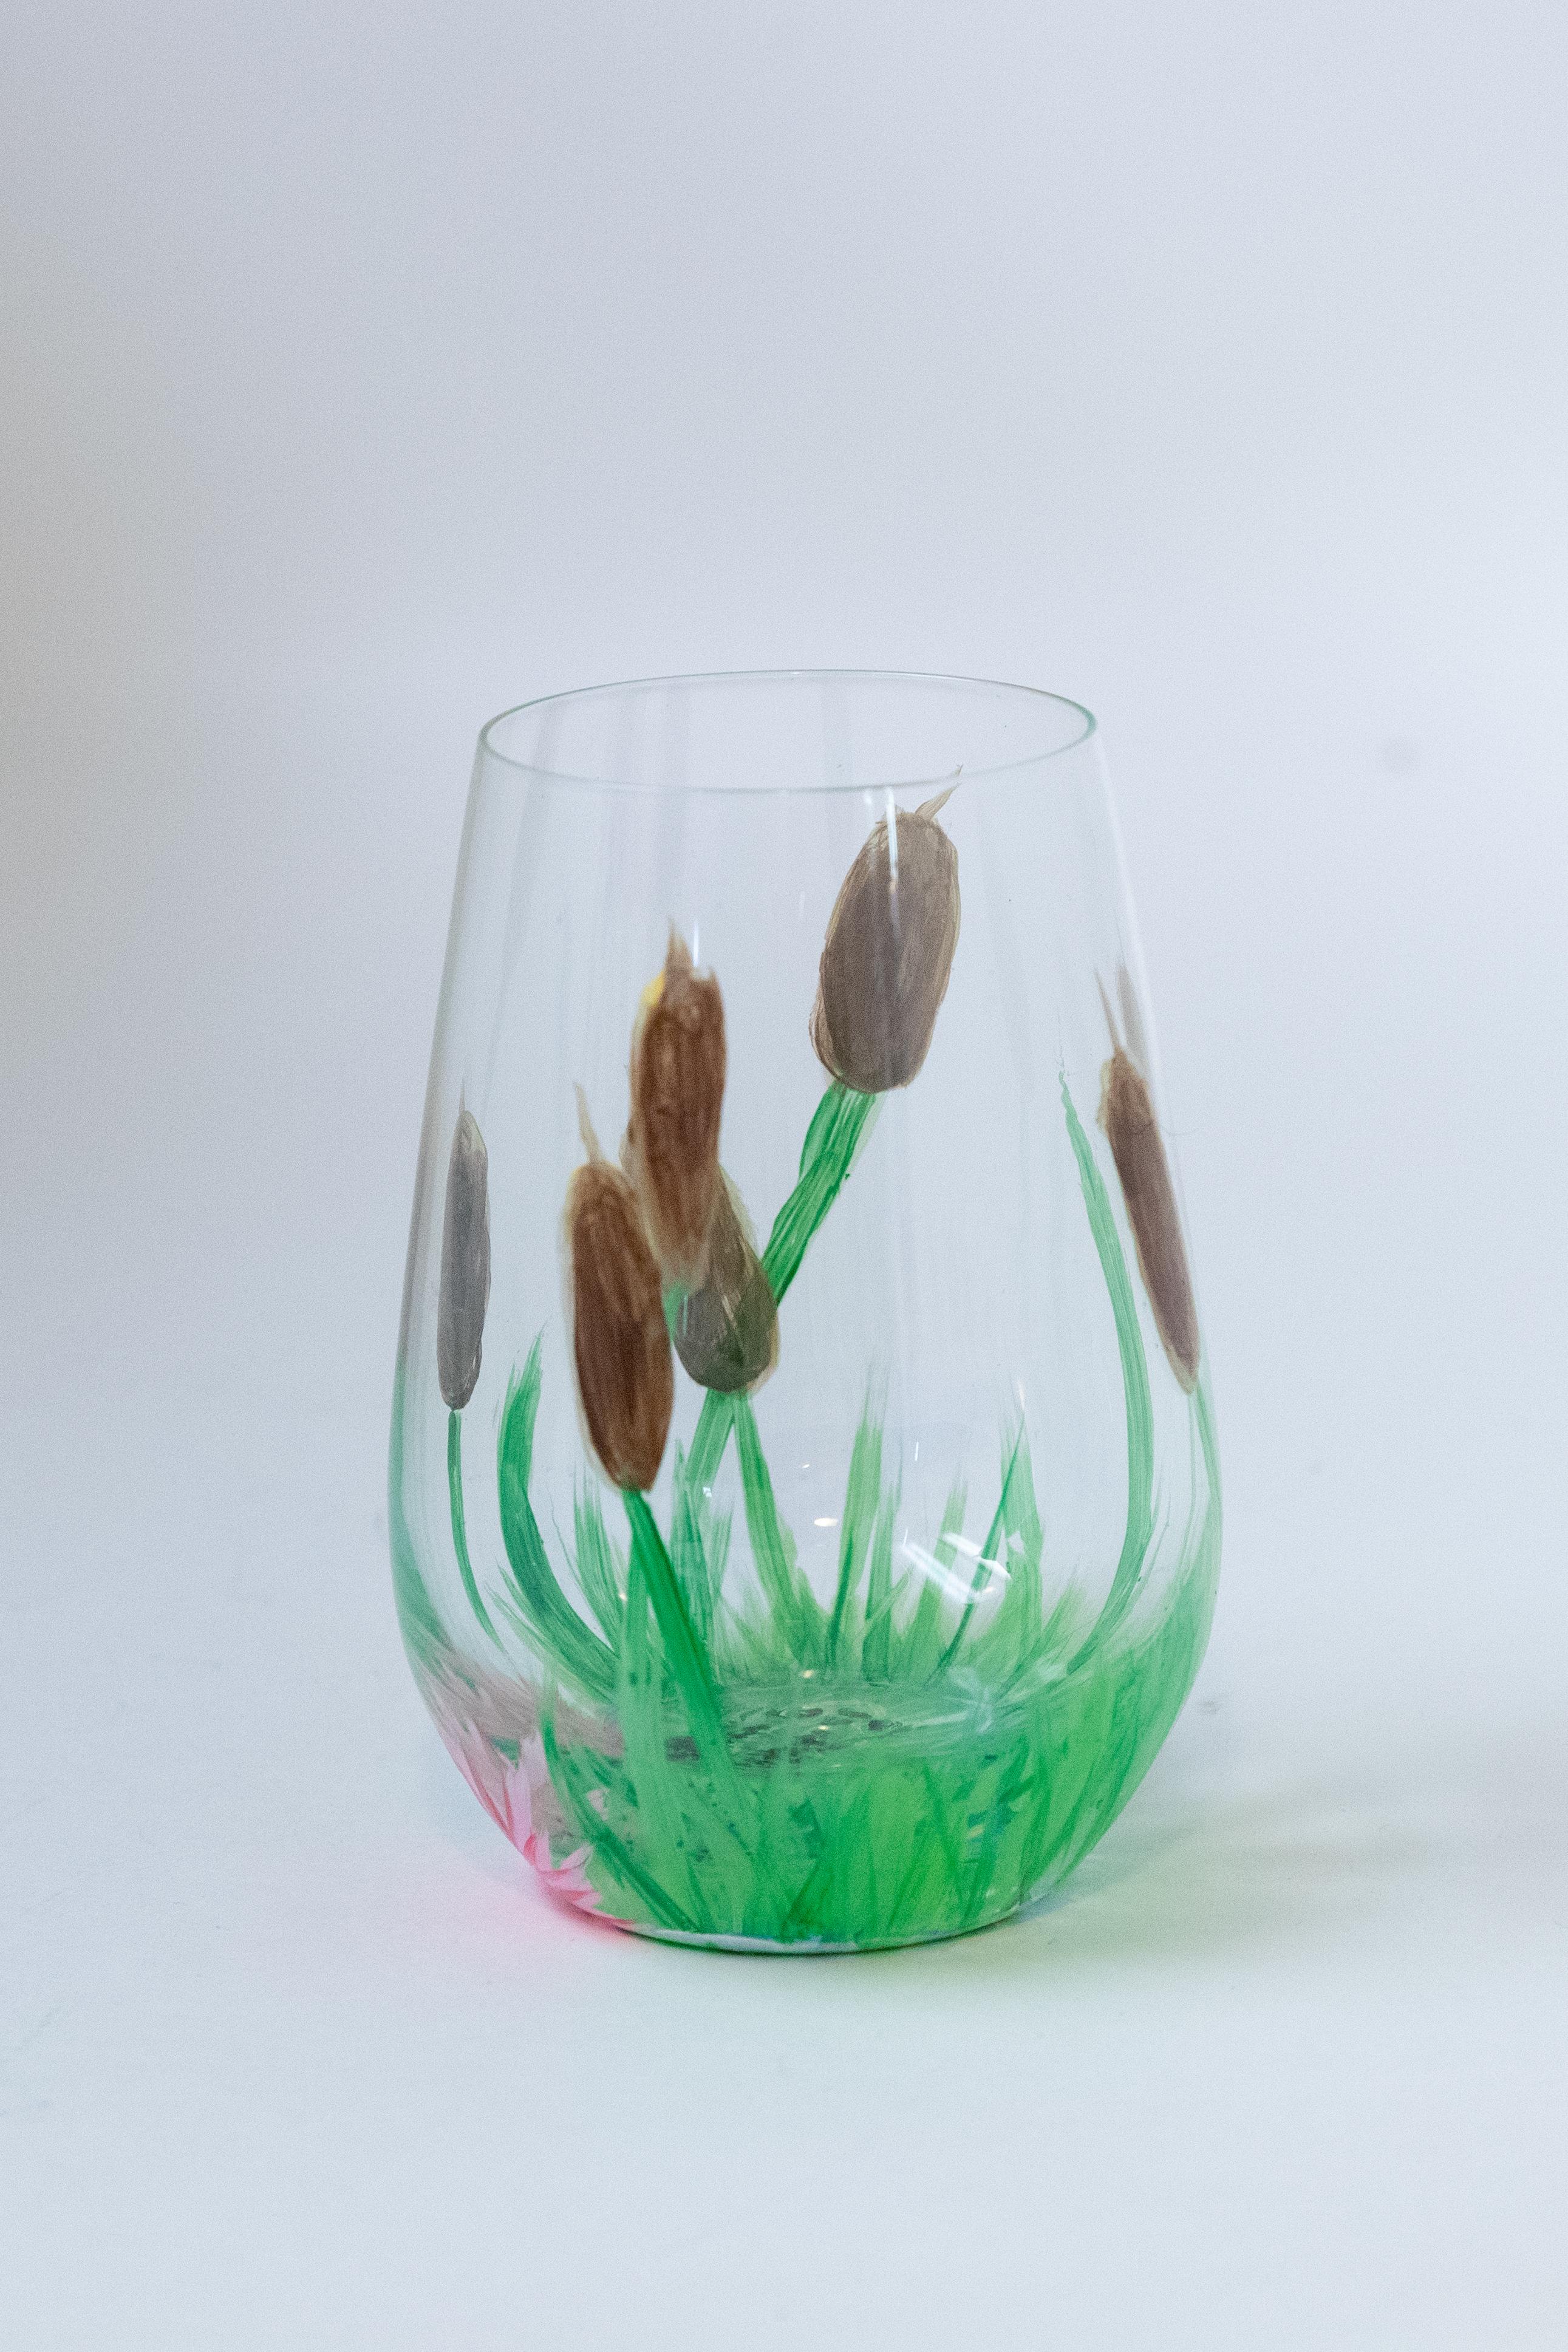 Frog glass 3_1331